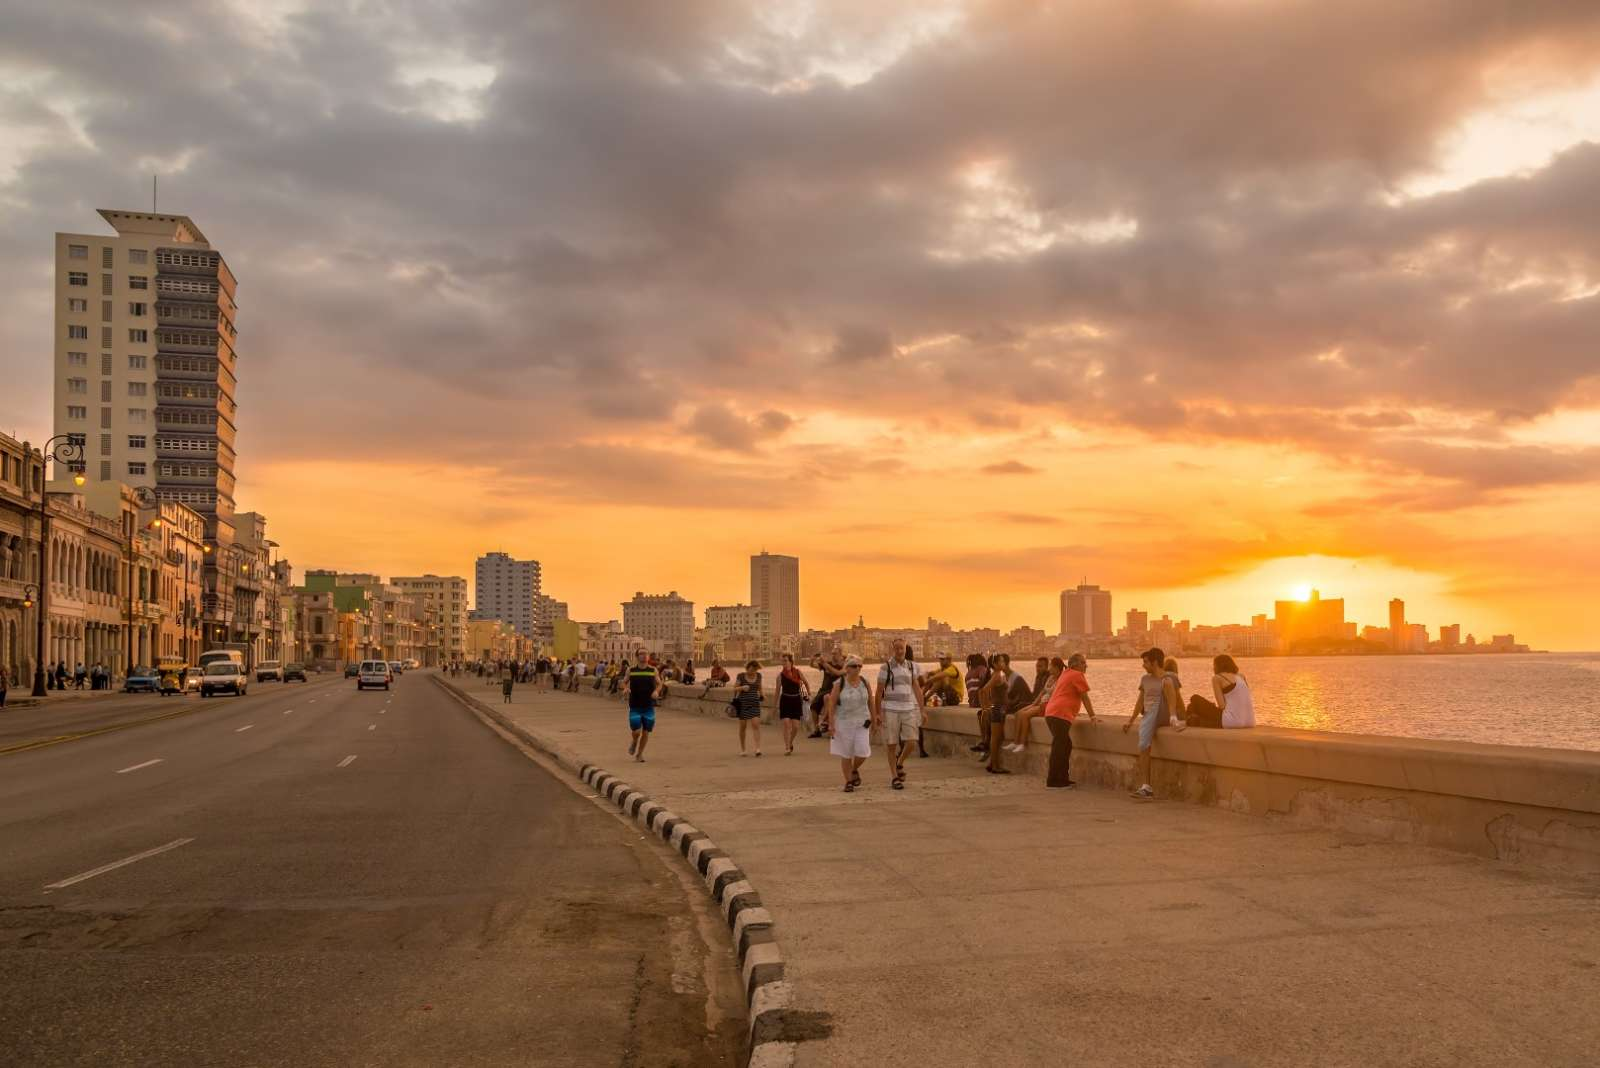 Sunset over the Malecon in Havana, Cuba